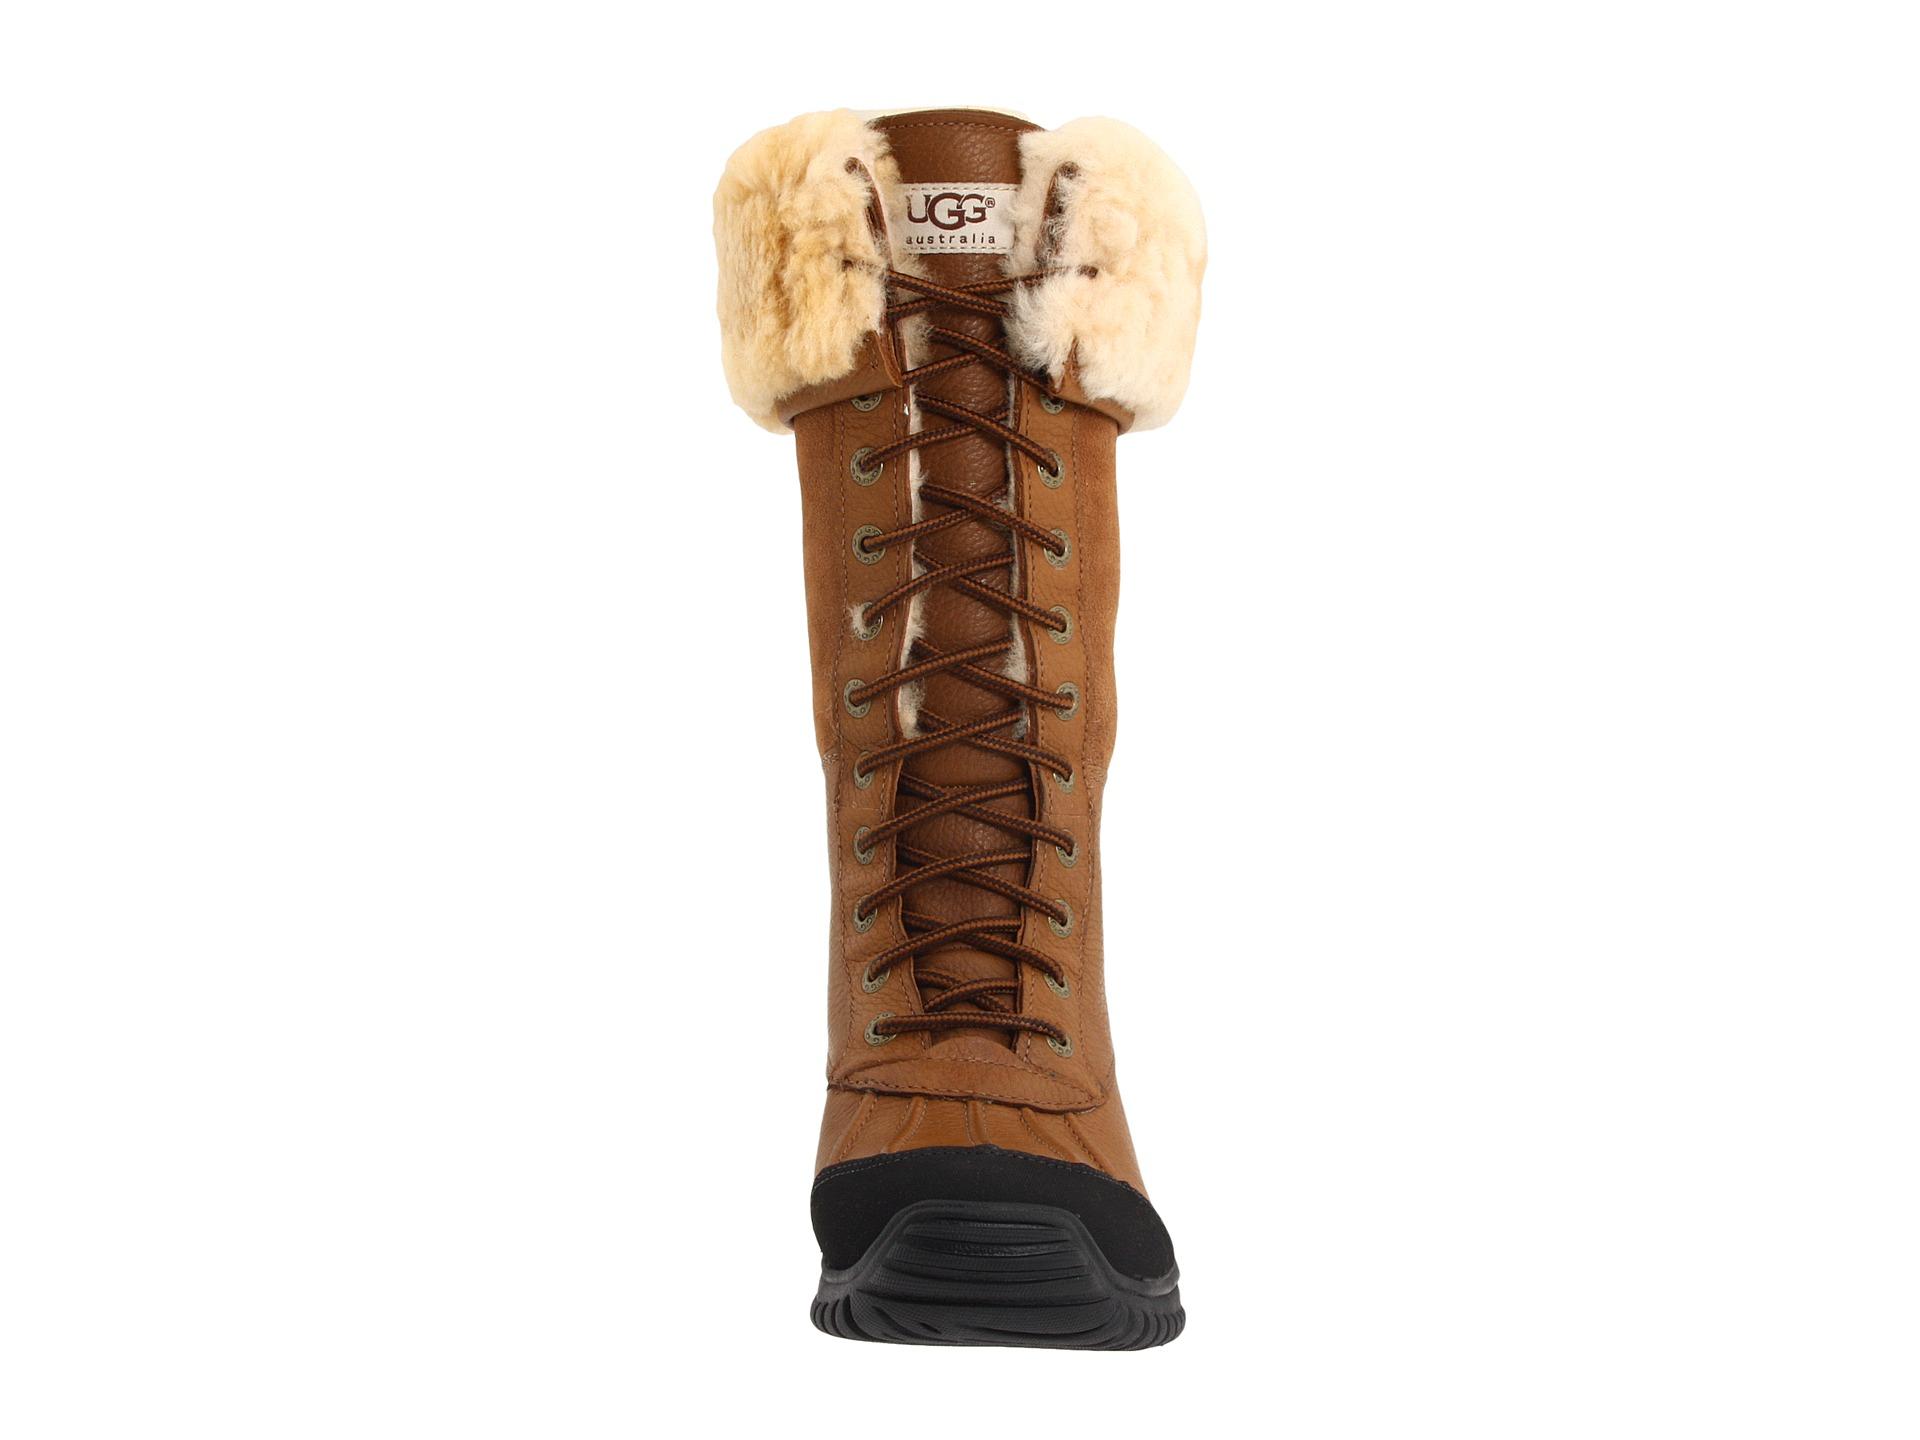 a0e154f4468 Ugg Adirondack Otter Tall | MIT Hillel